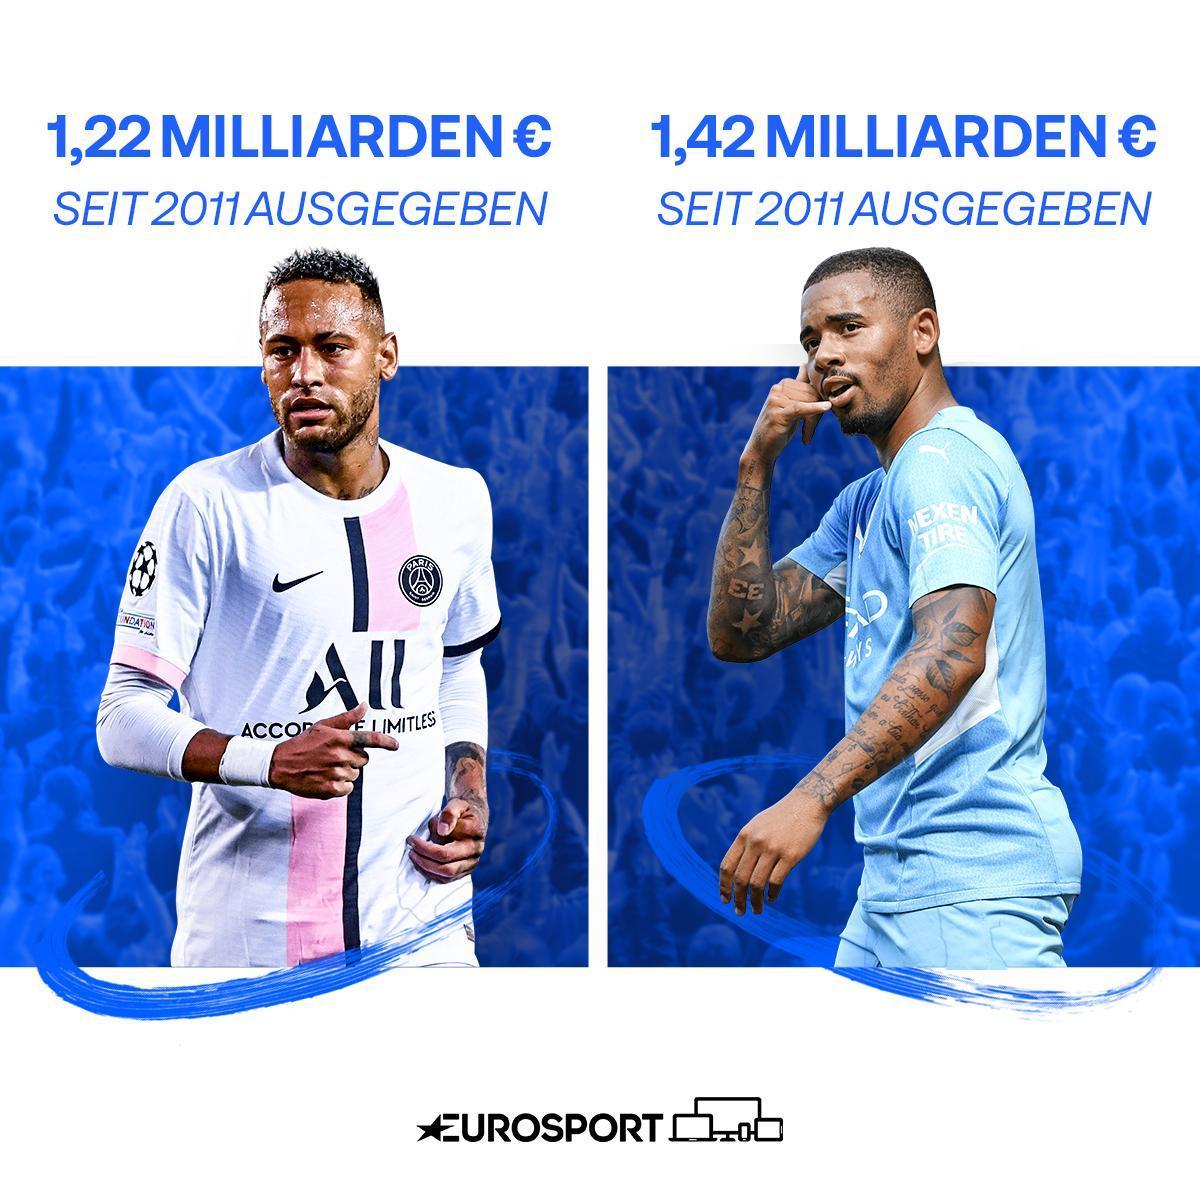 Eurosport DE (@Eurosport_DE)